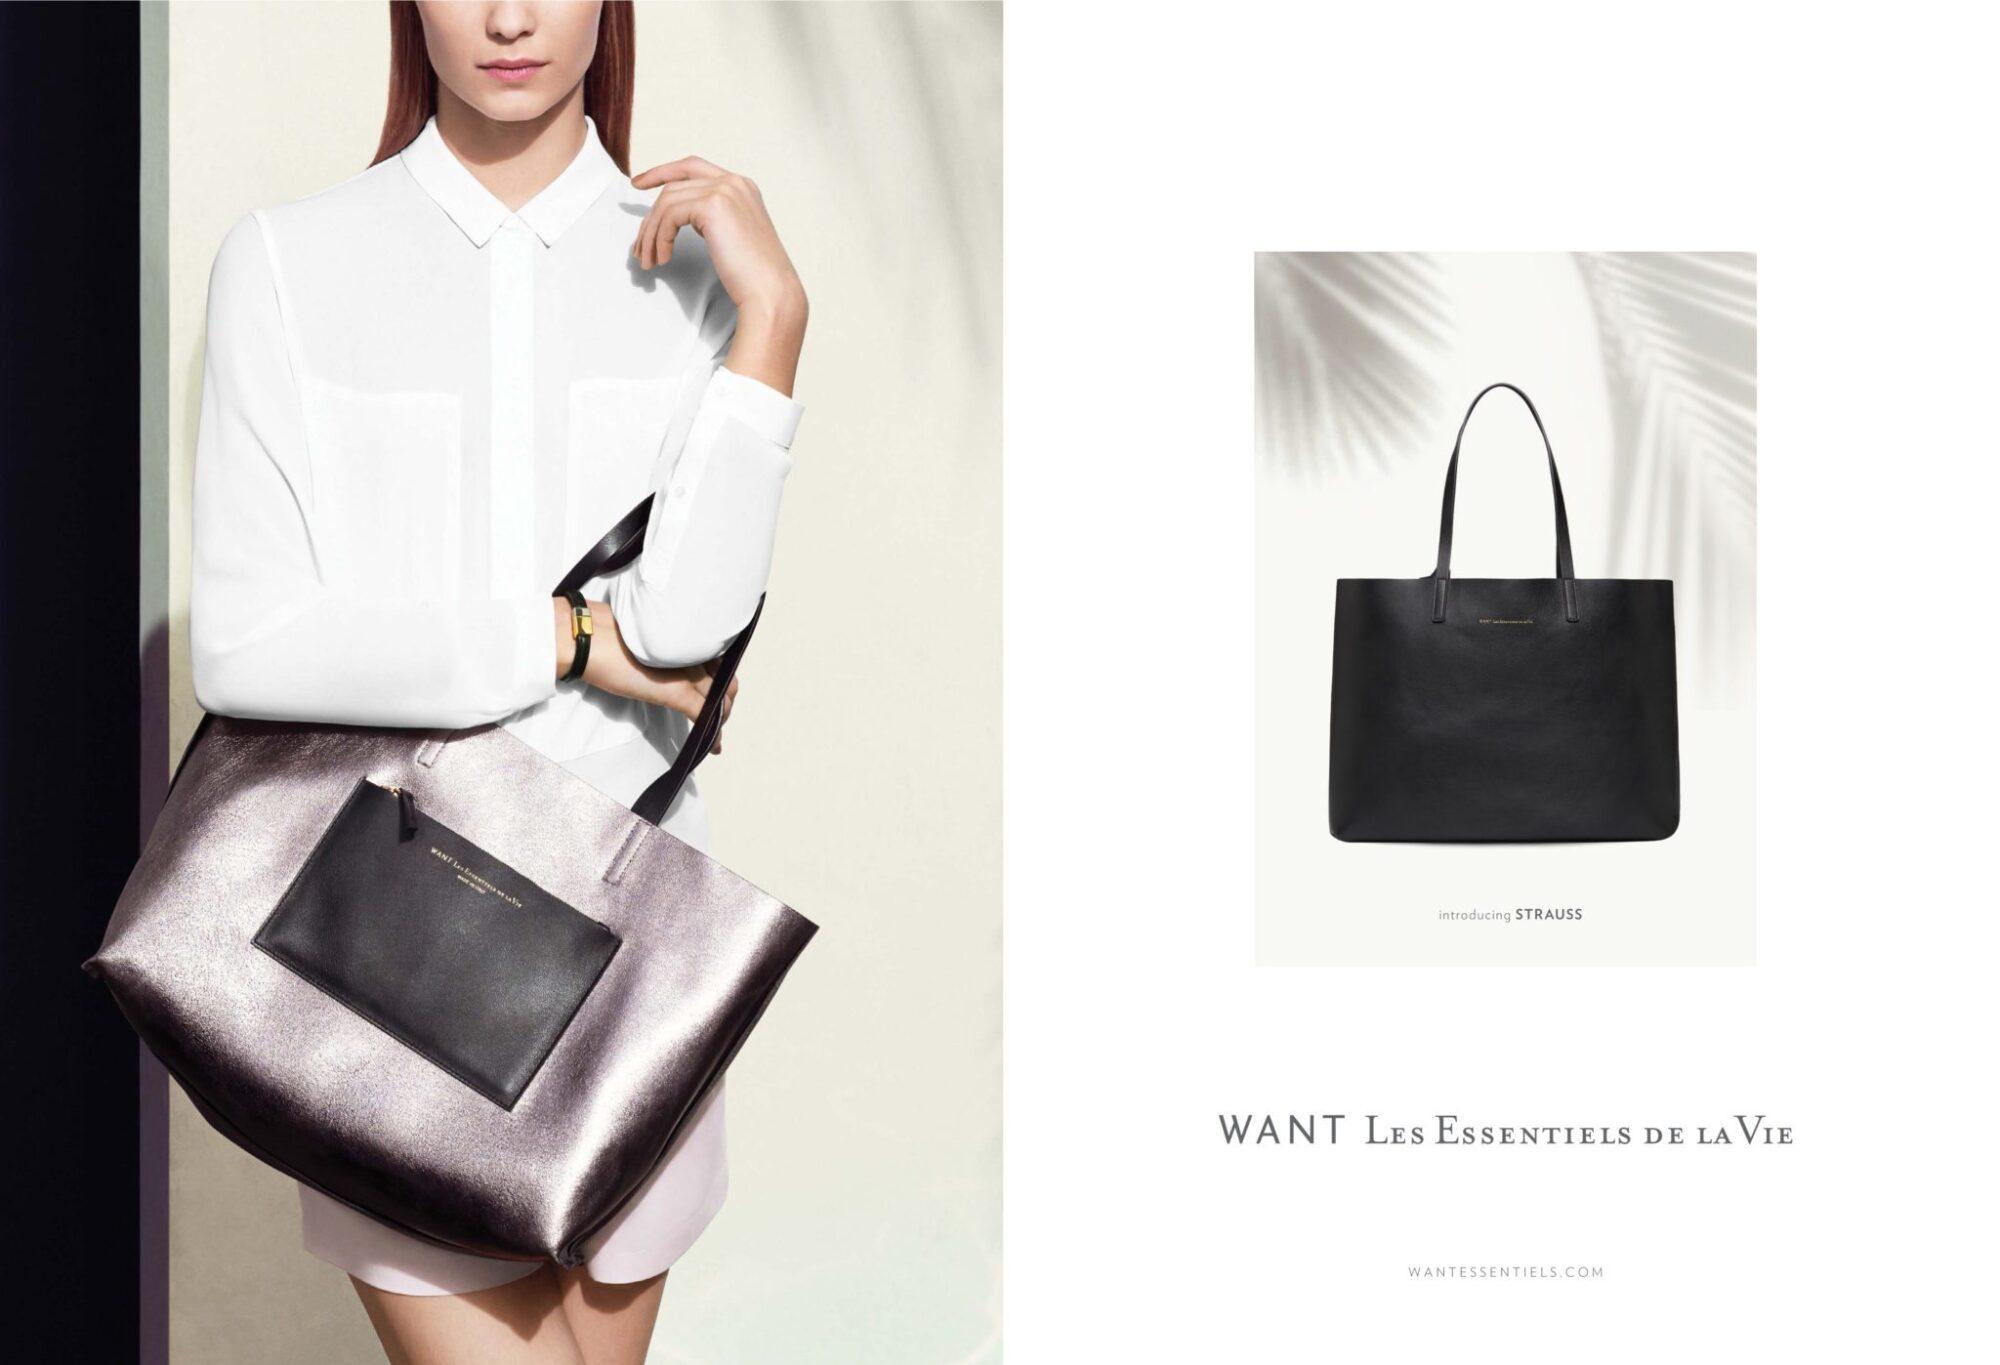 7e493a997 Want Les Essentiels Spring 2015 Ad Campaign